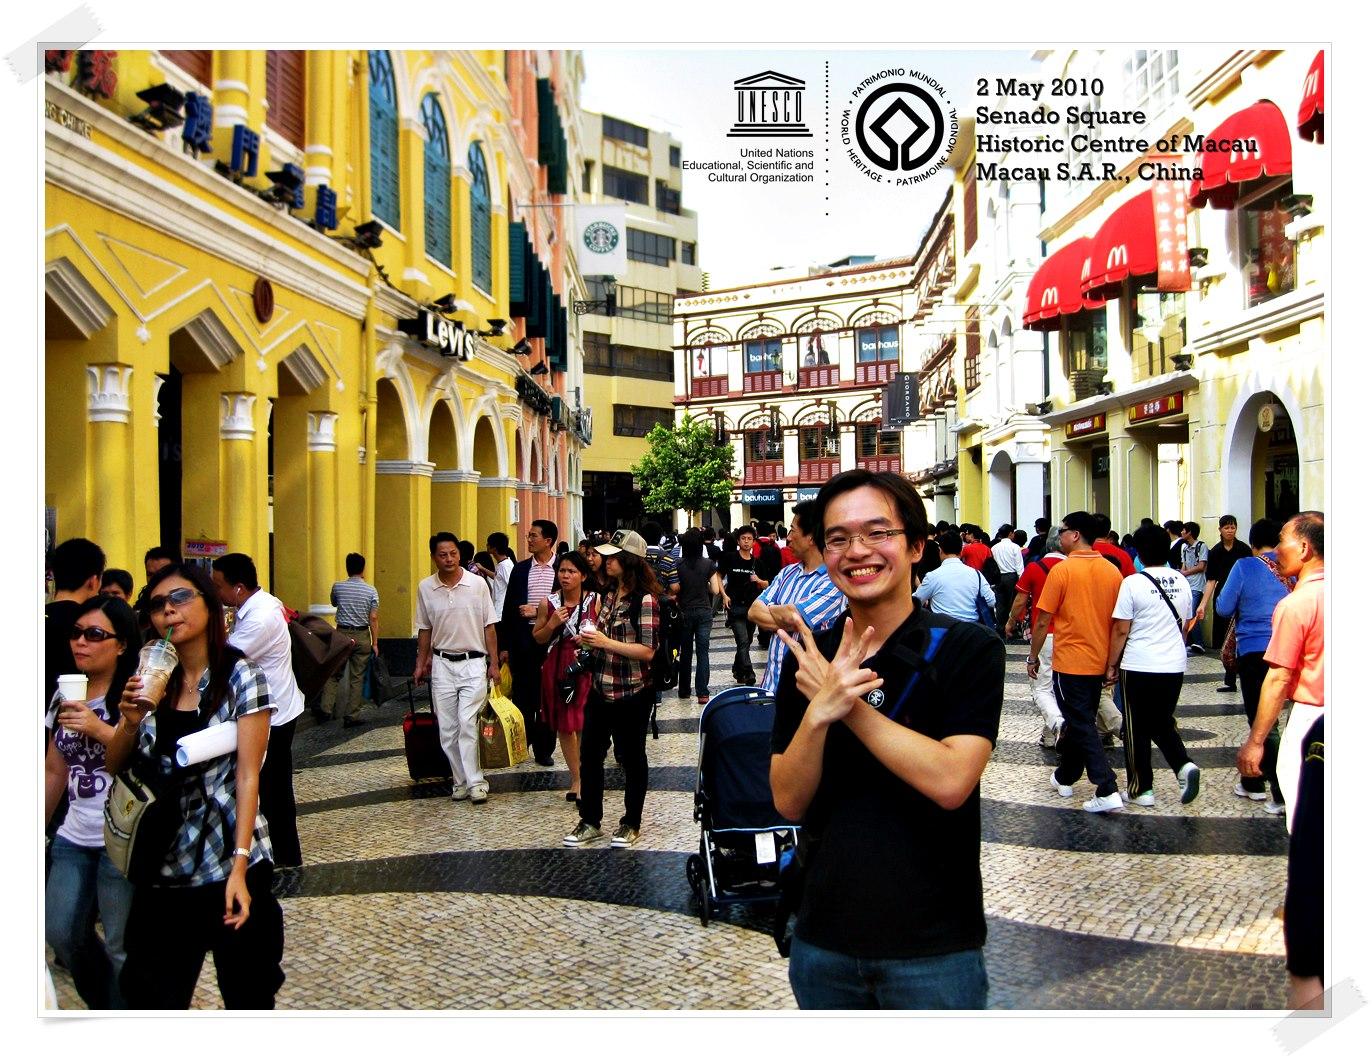 Leal Senado Square, the Heart of Macao Historic Centre of Macao - China  Thomas shaw